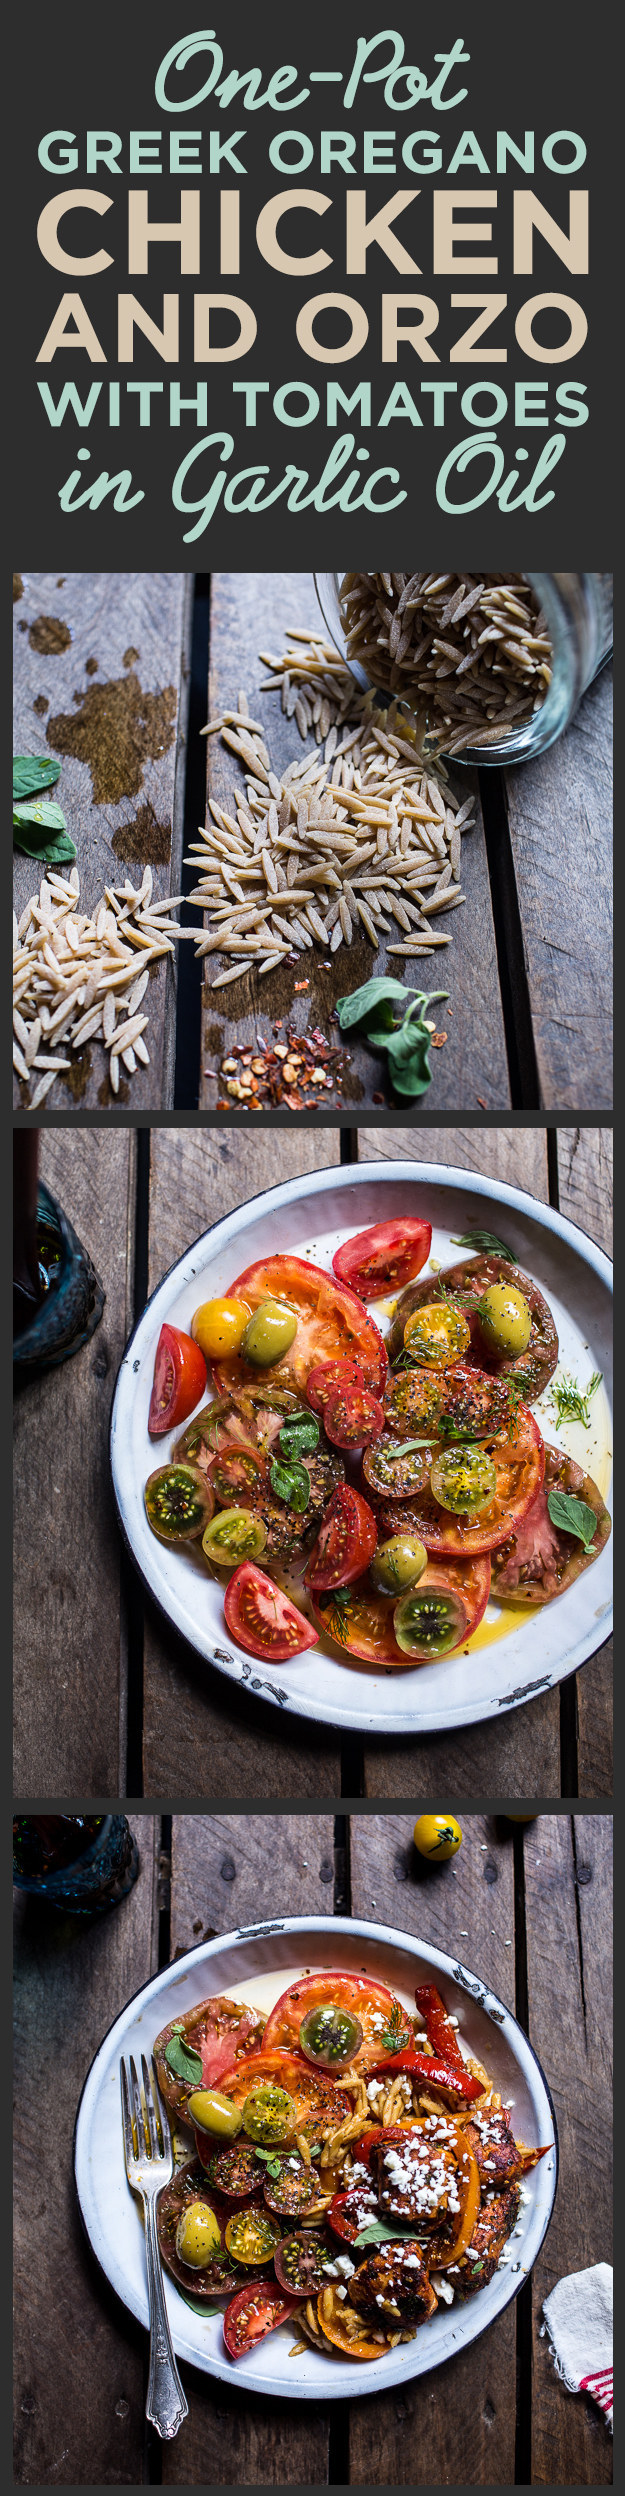 7 Tasty Dinners To Make This Week